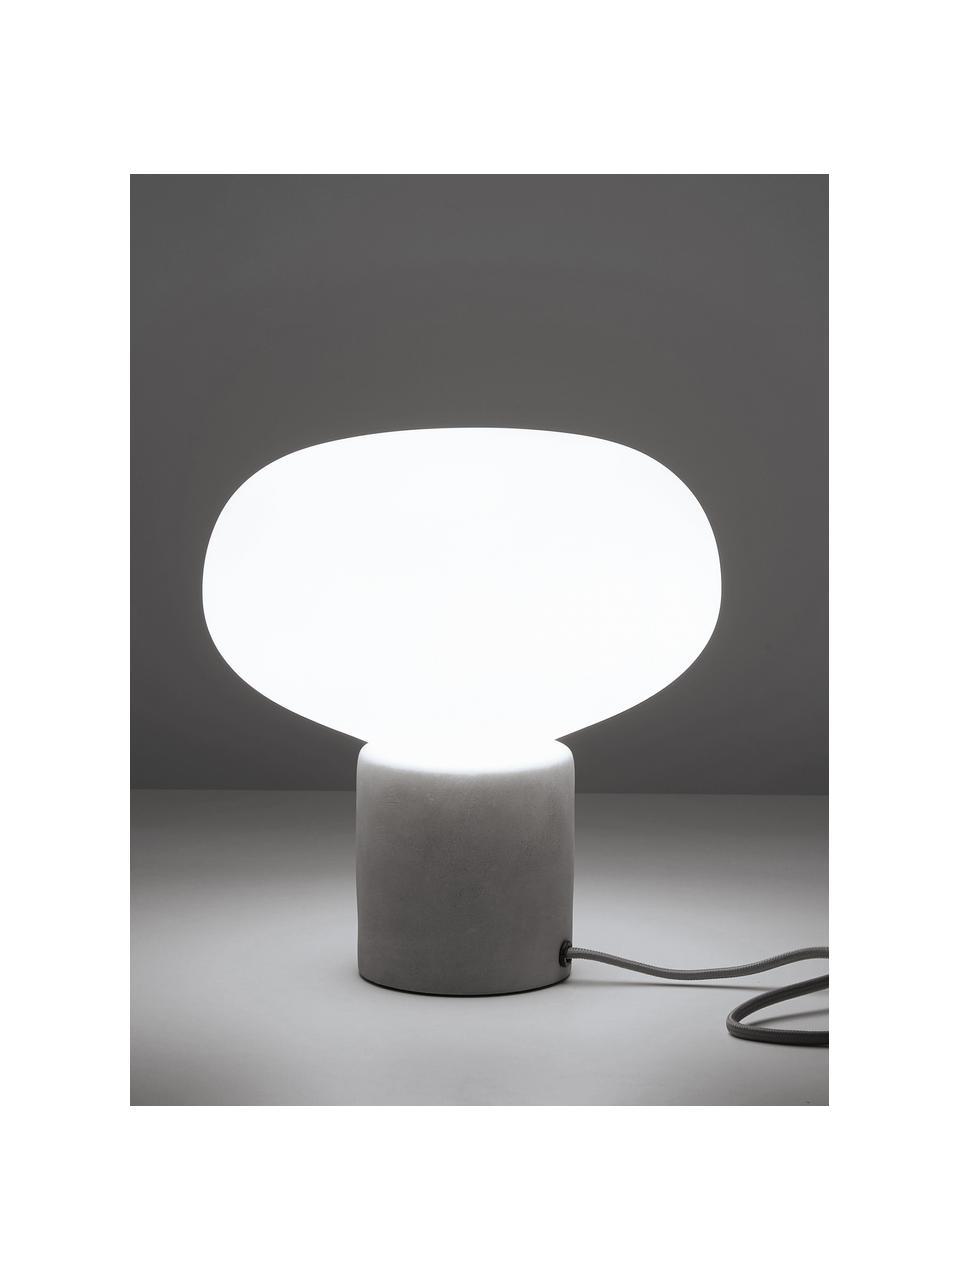 Kleine nachtlampje Alma betonnen voet, Lampvoet: beton, Lampenkap: glas, Lampvoet: grijs, betonkleurig. Lampenkap: wit, Ø 23 x H 24 cm